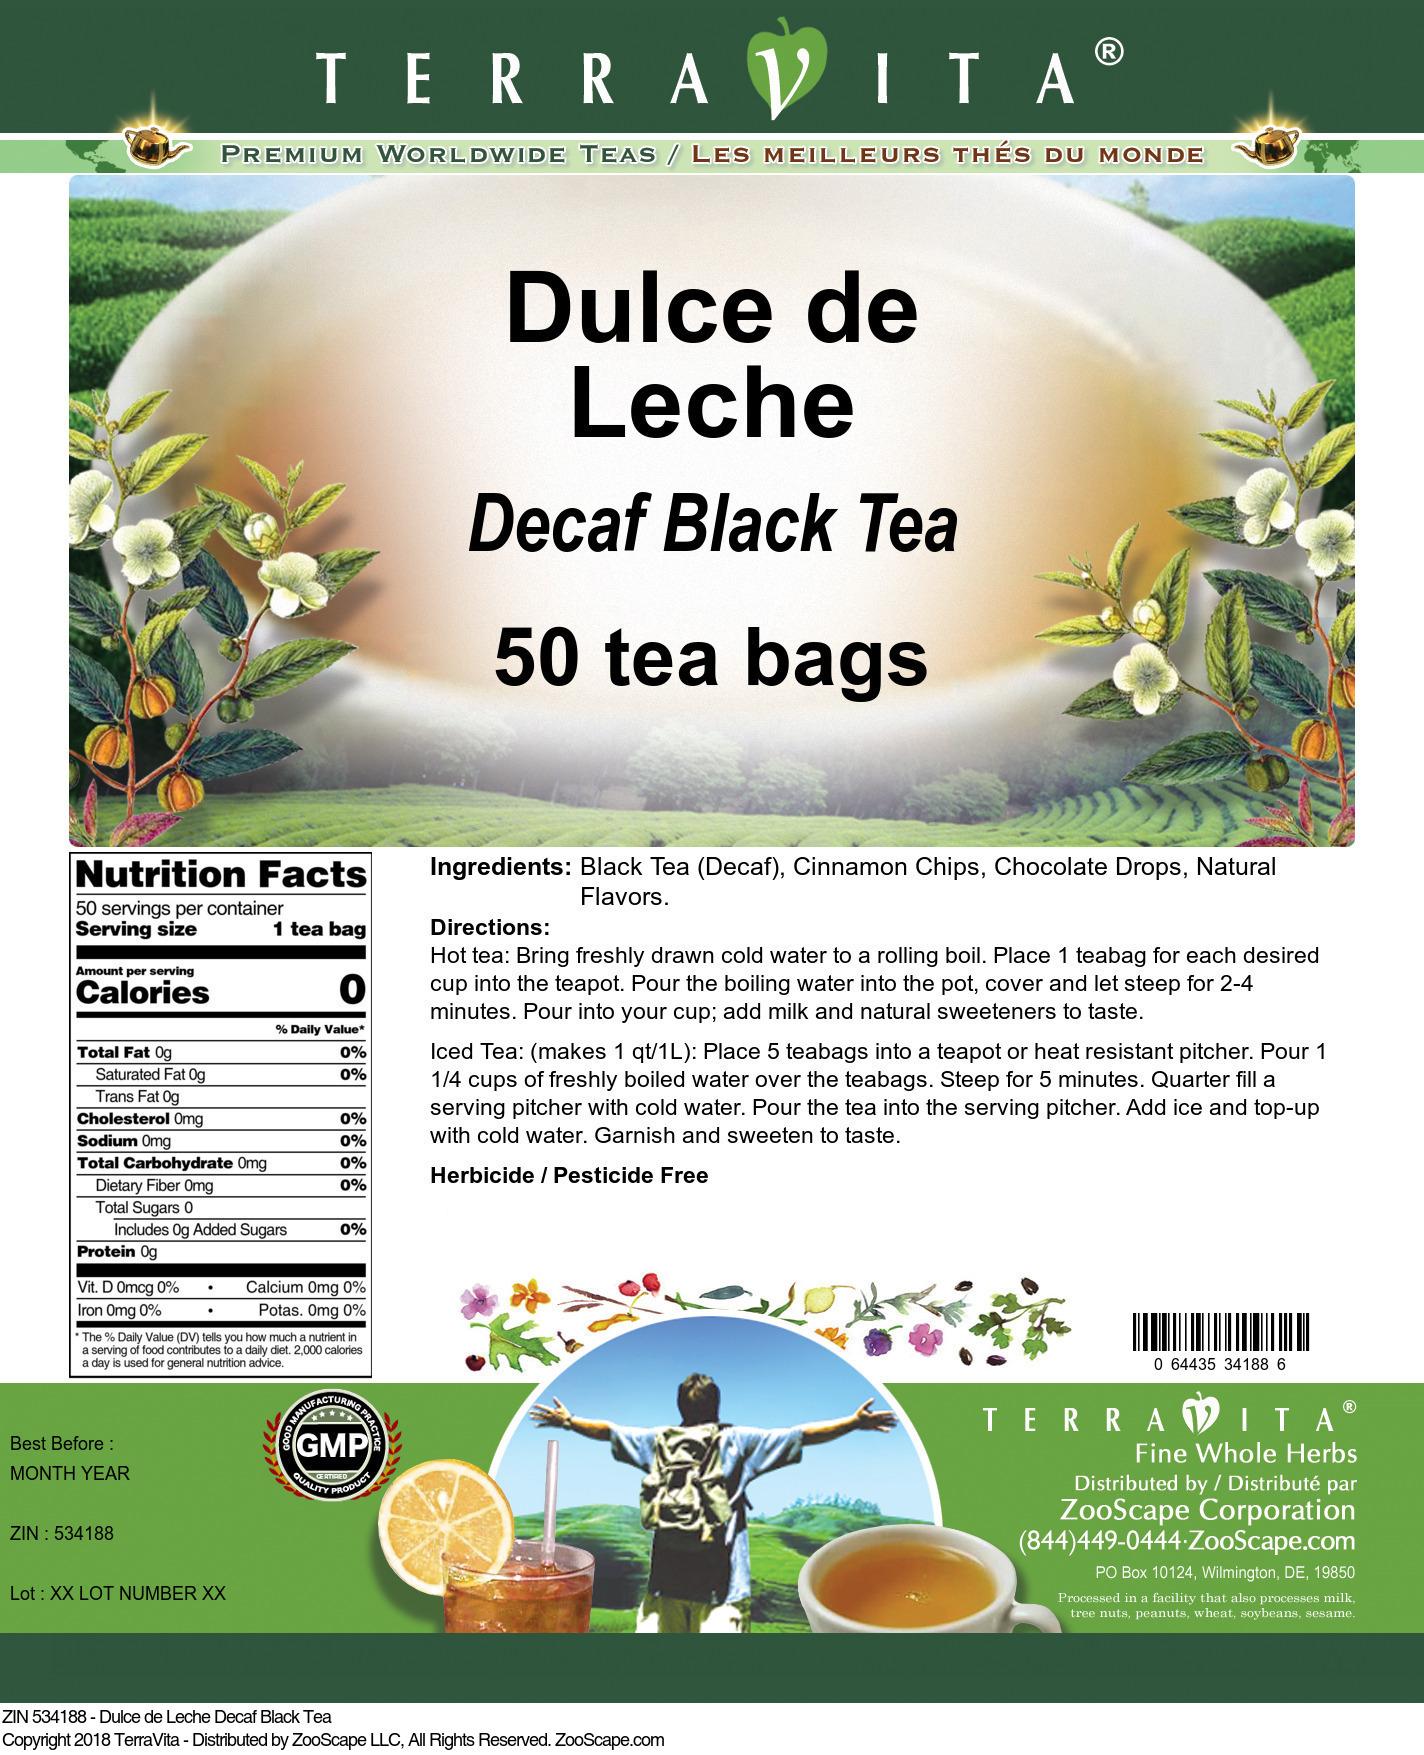 Dulce de Leche Decaf Black Tea